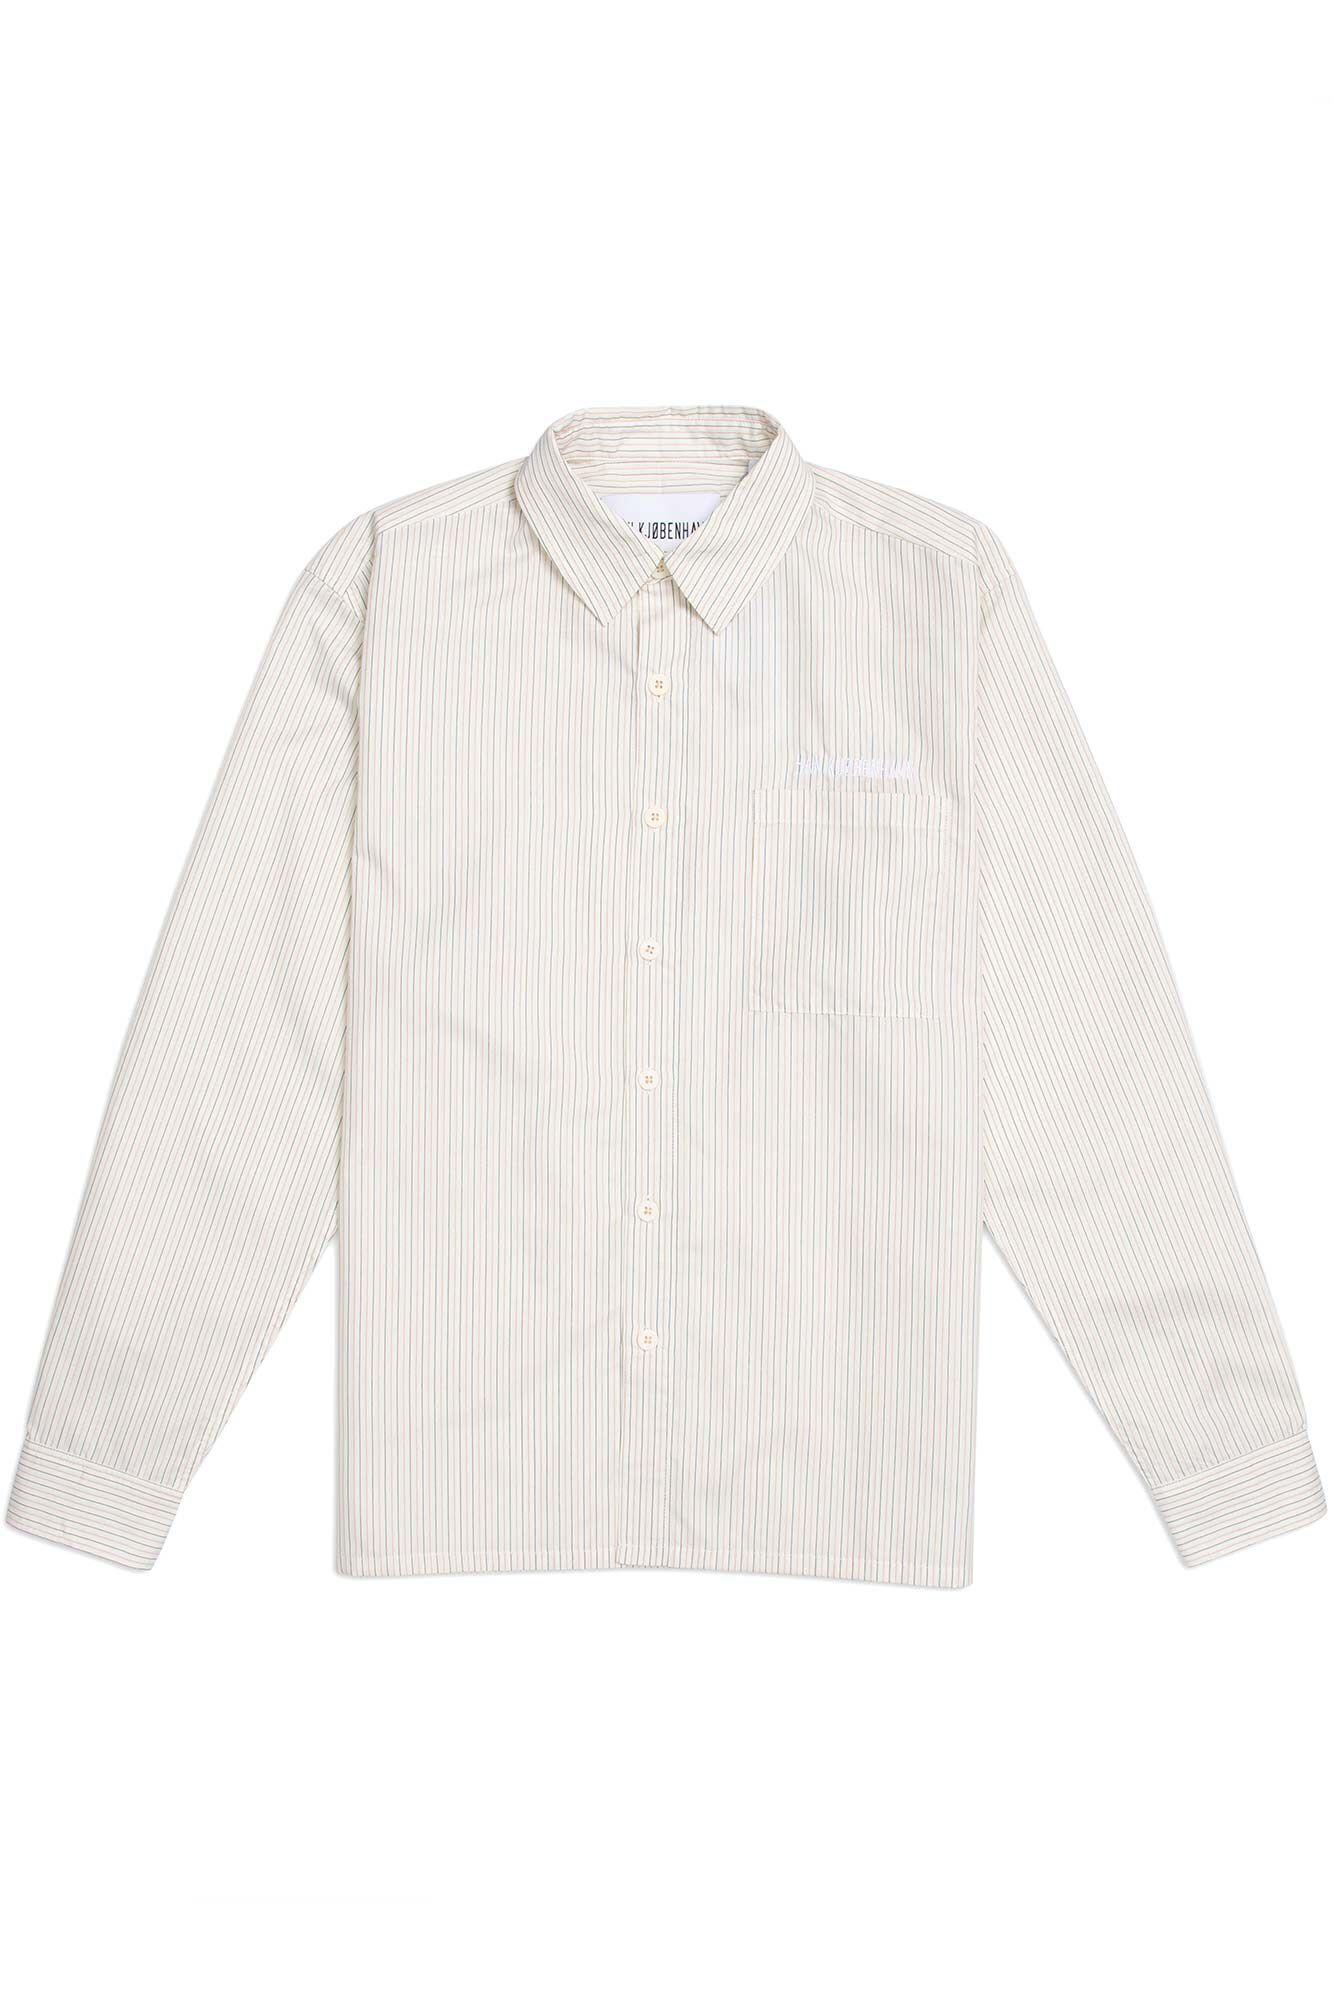 Boxy shirt M-120006, WHITE STRIPED